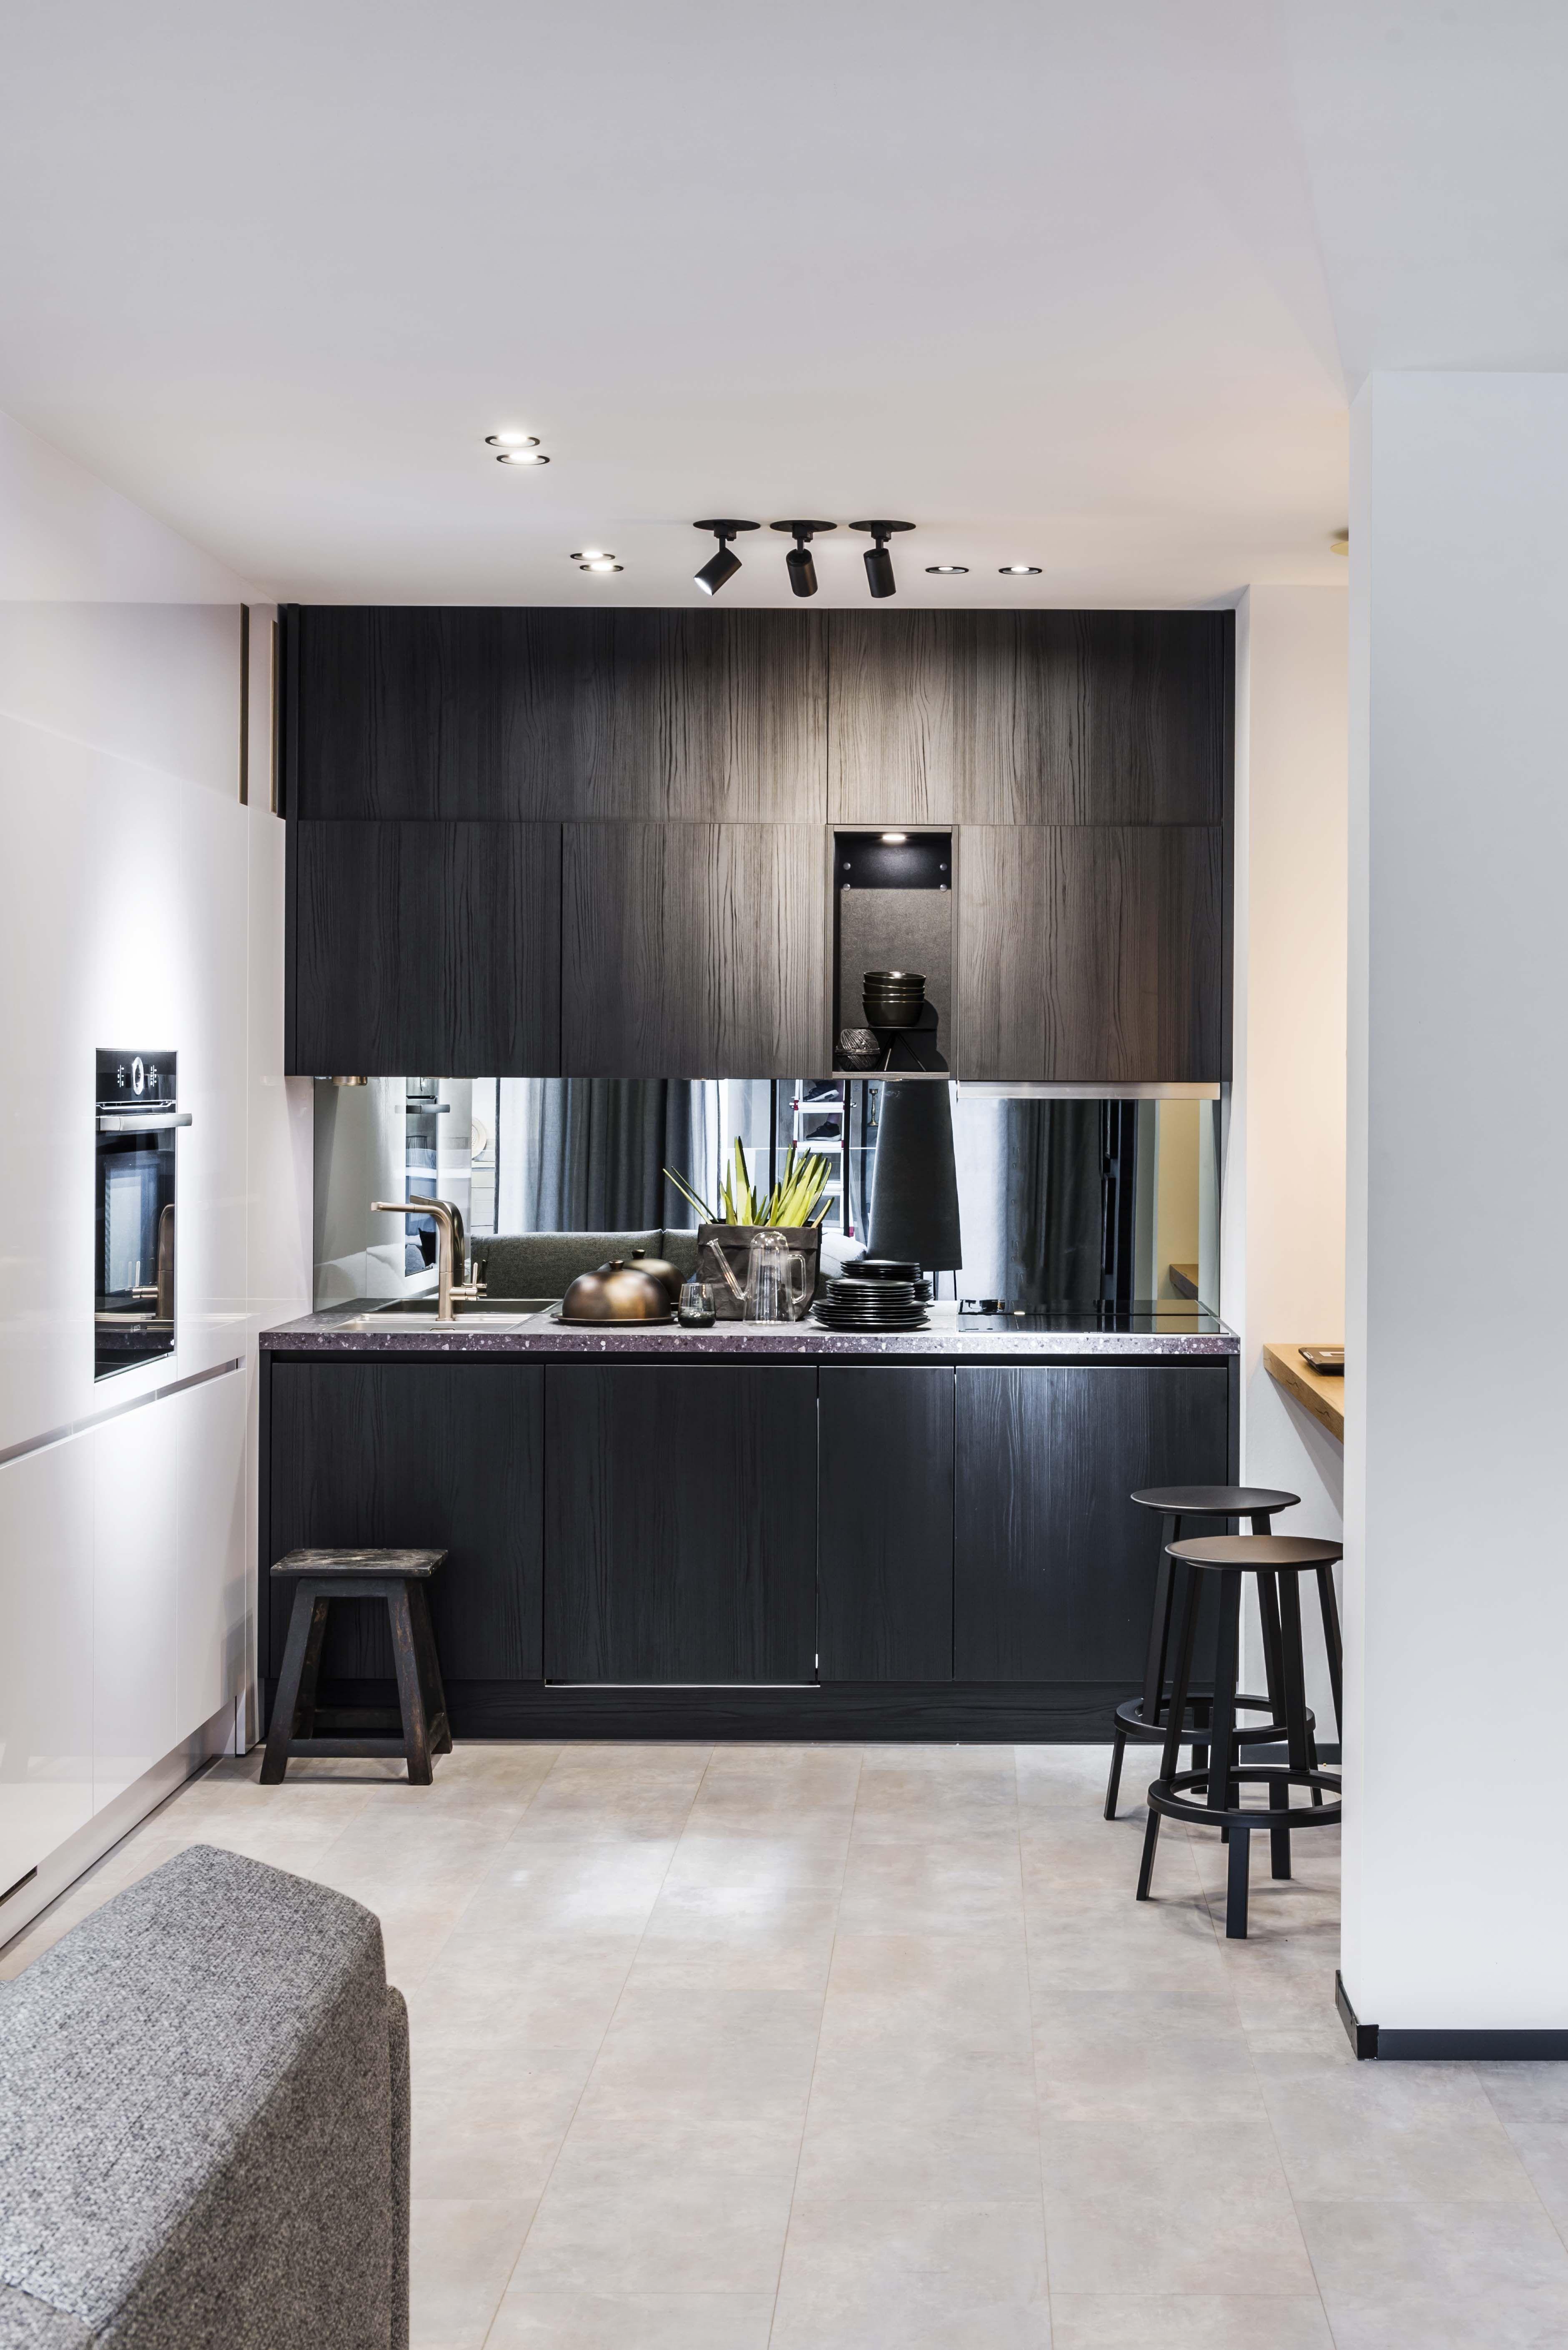 Compacte Moderne Keuken Slaapkamer Interieur Kamer Decoratie